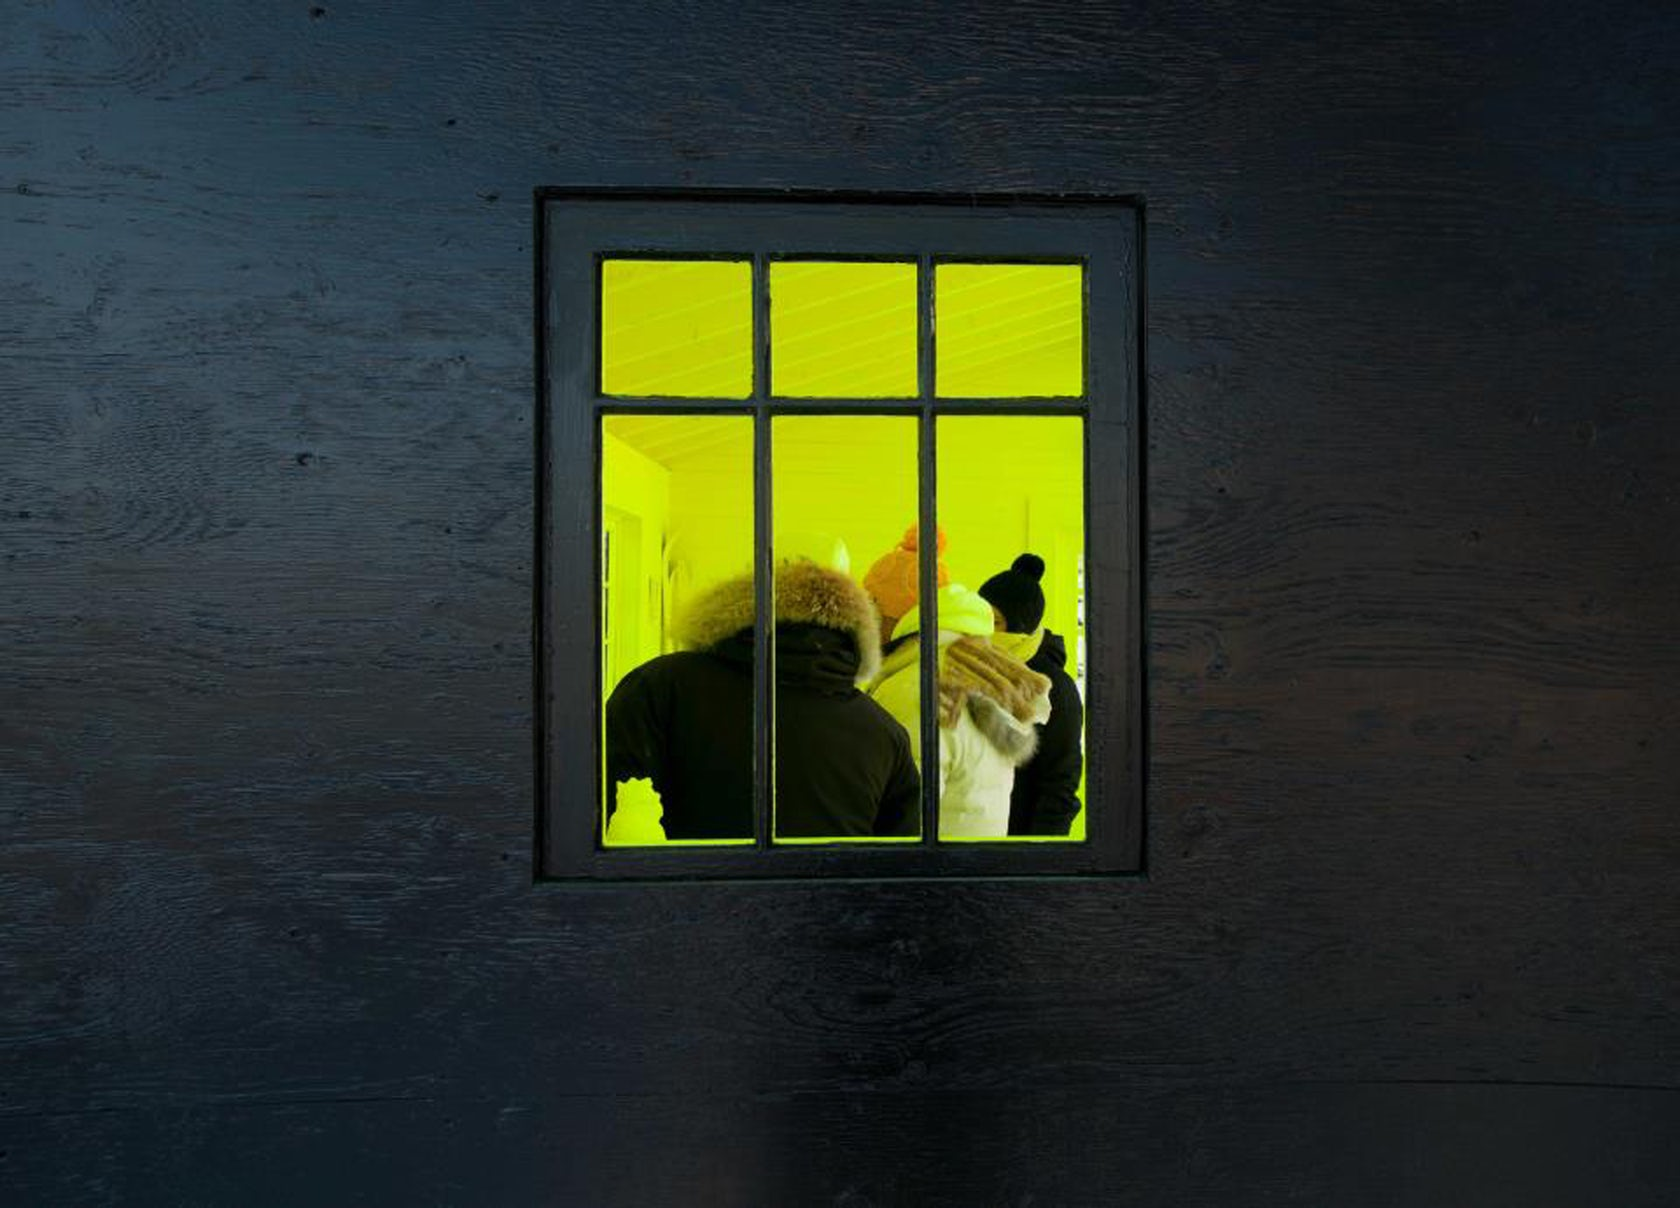 Hygge_House window